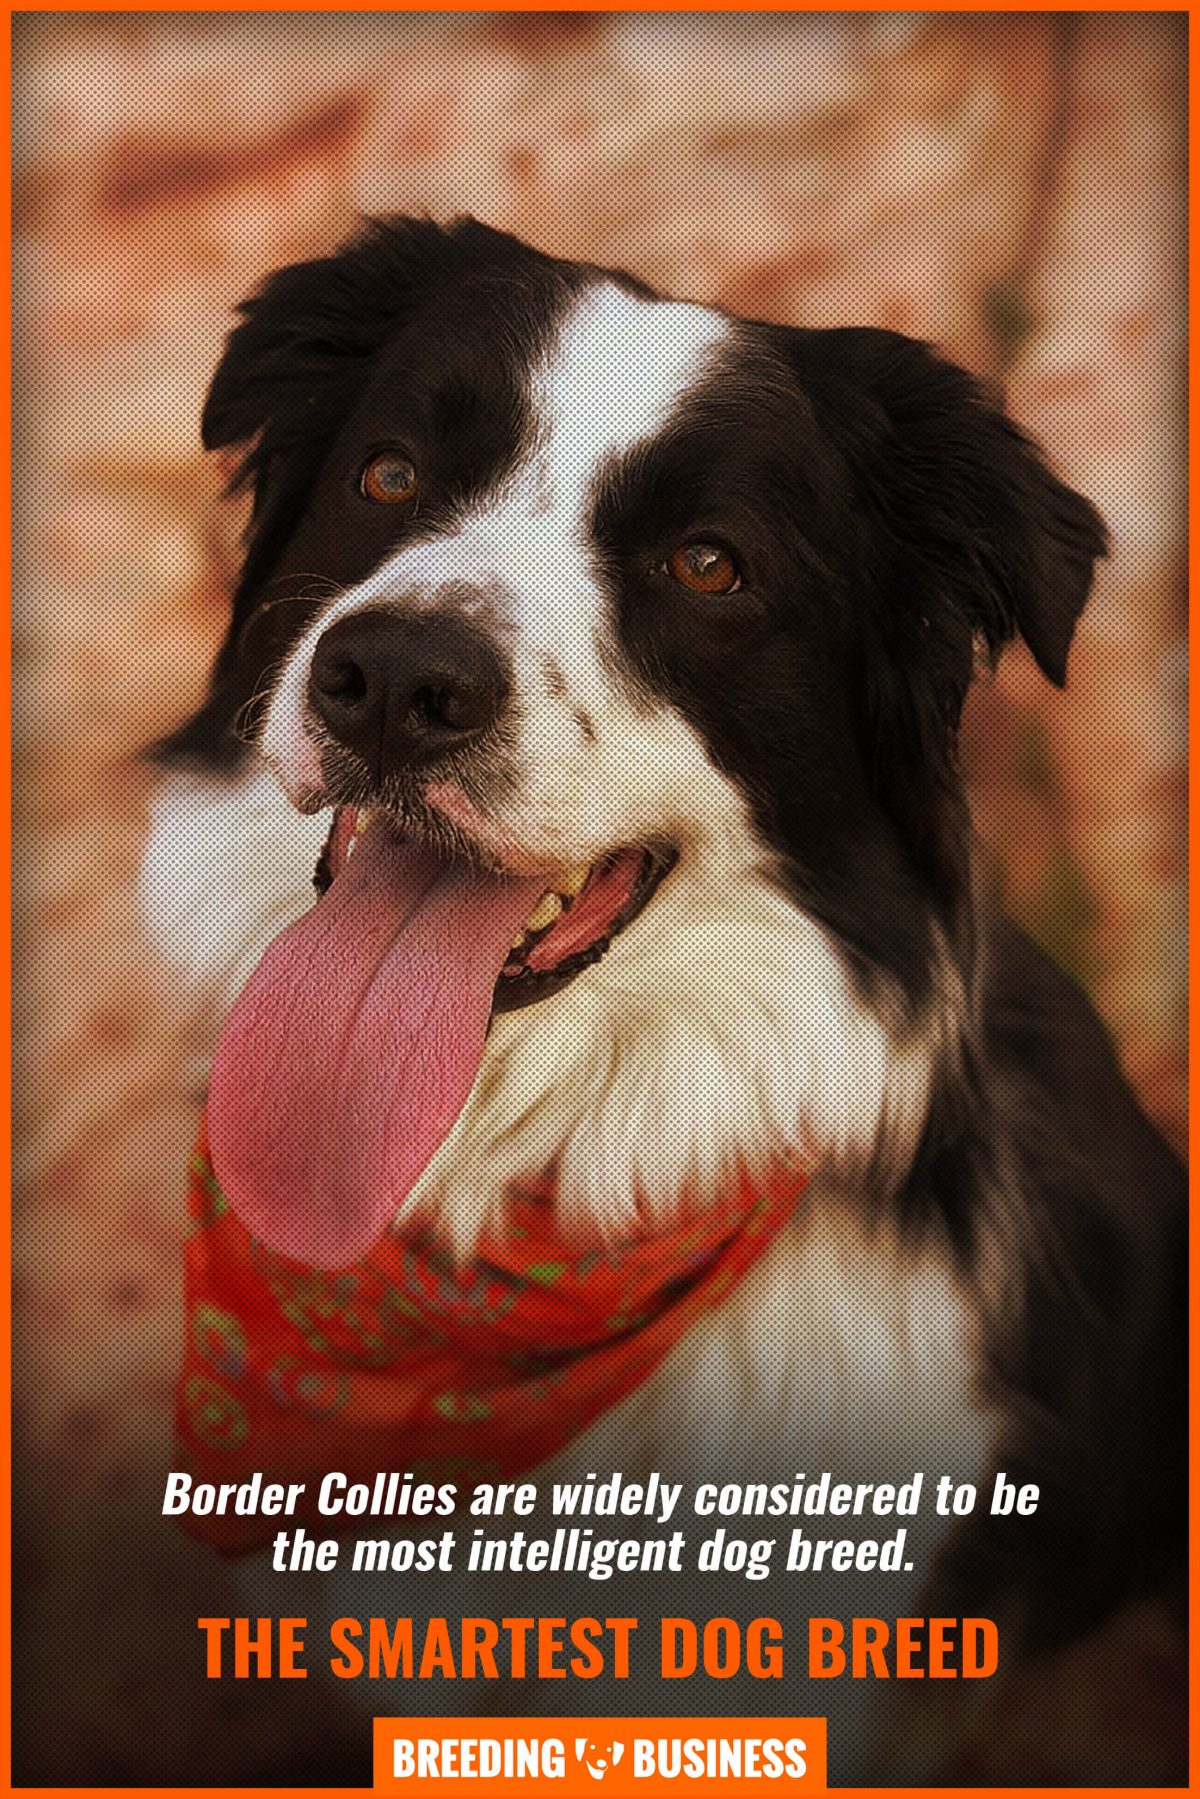 the smartest dog breed